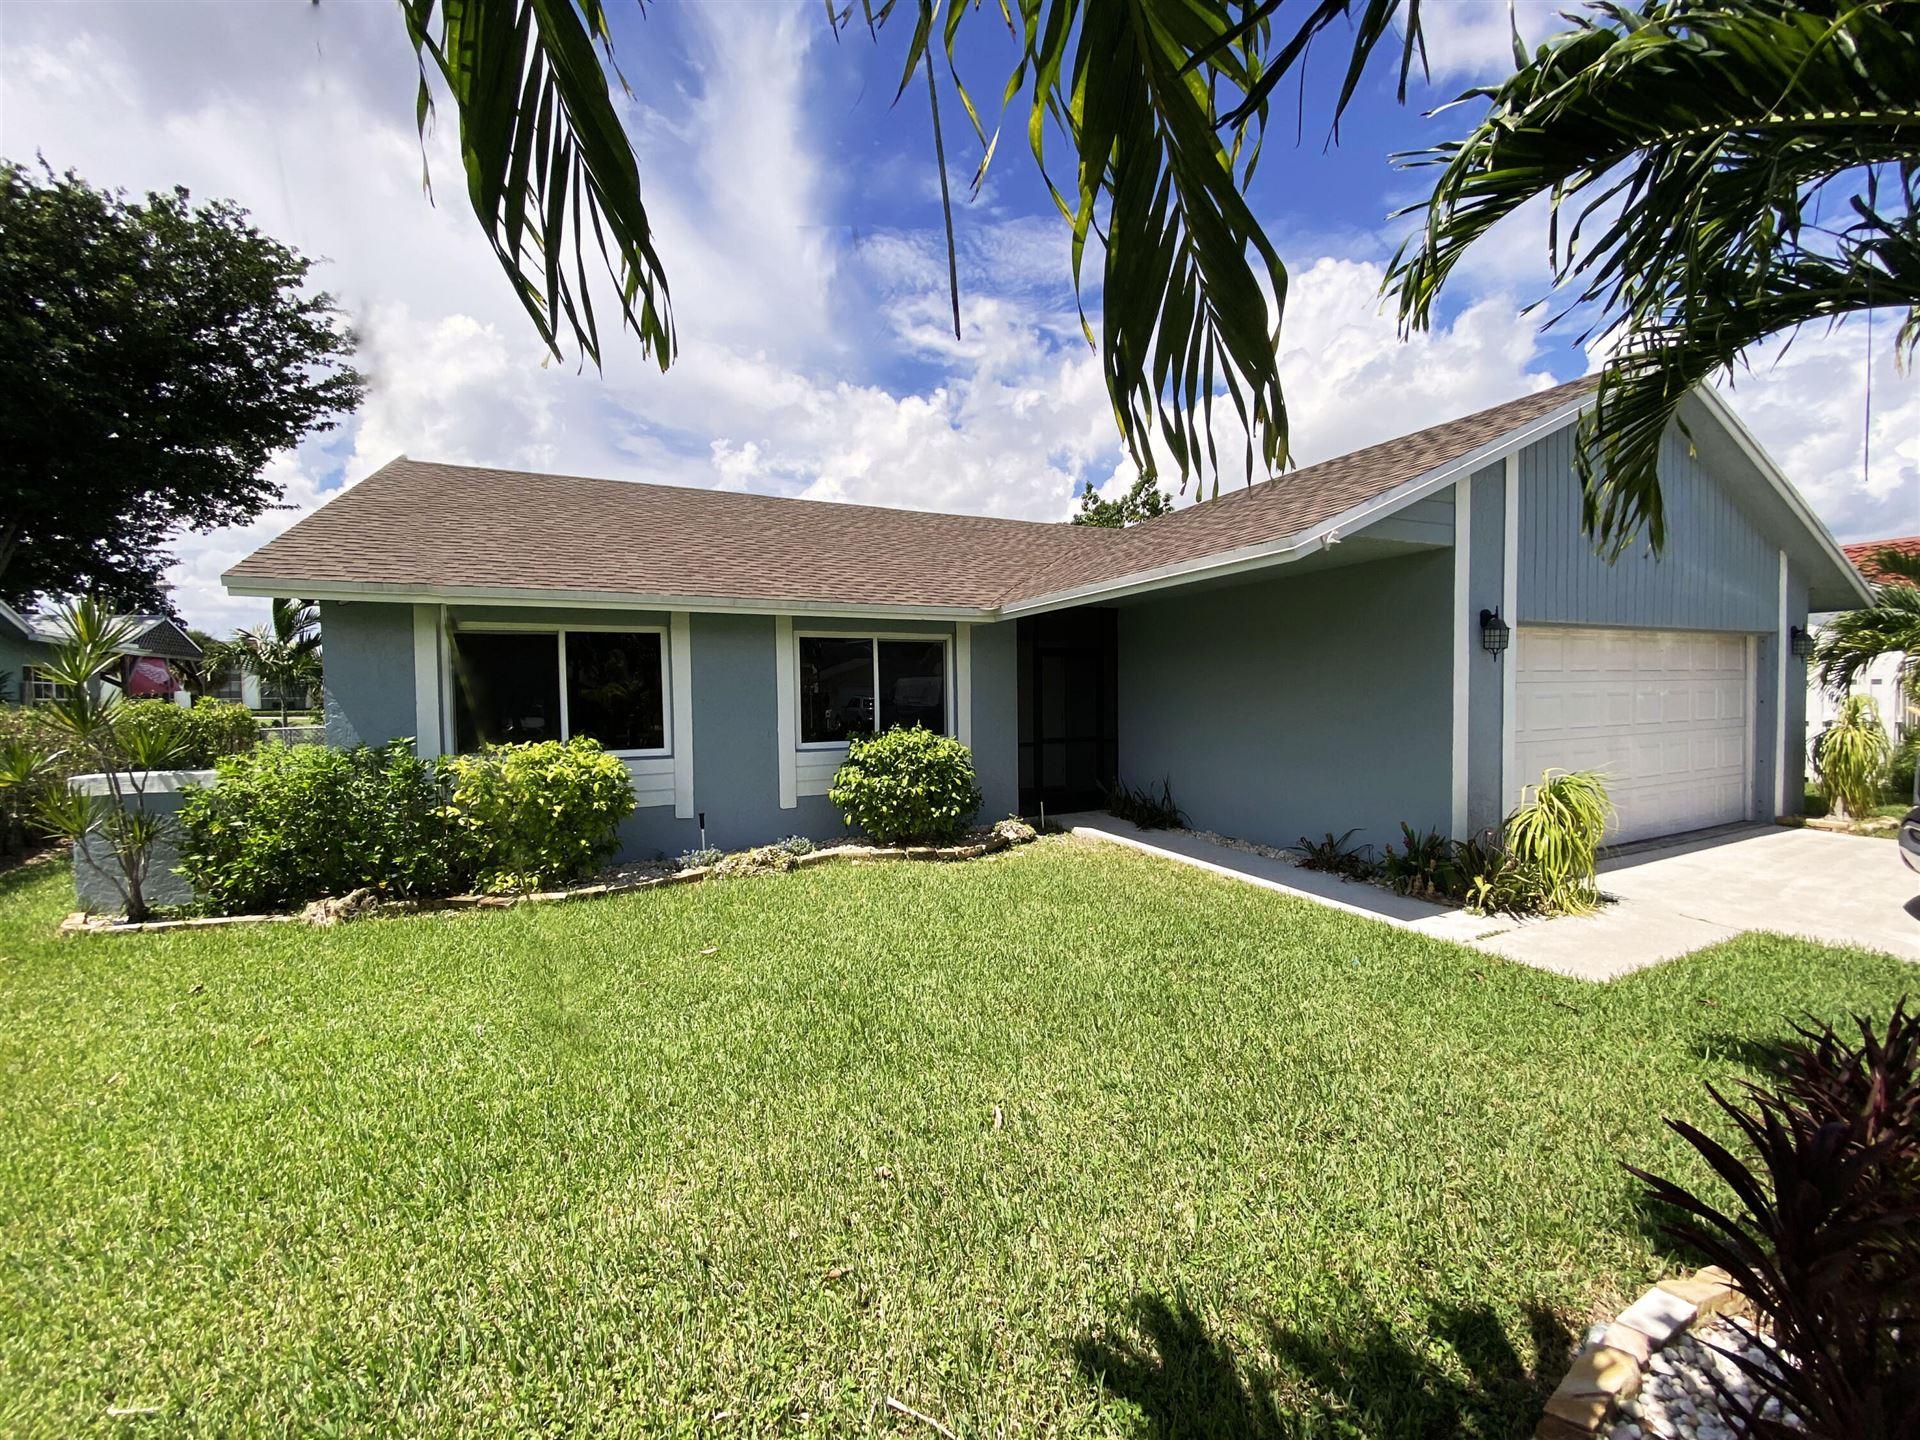 23251 SW 61st Avenue SW, Boca Raton, FL 33428 - MLS#: RX-10747166